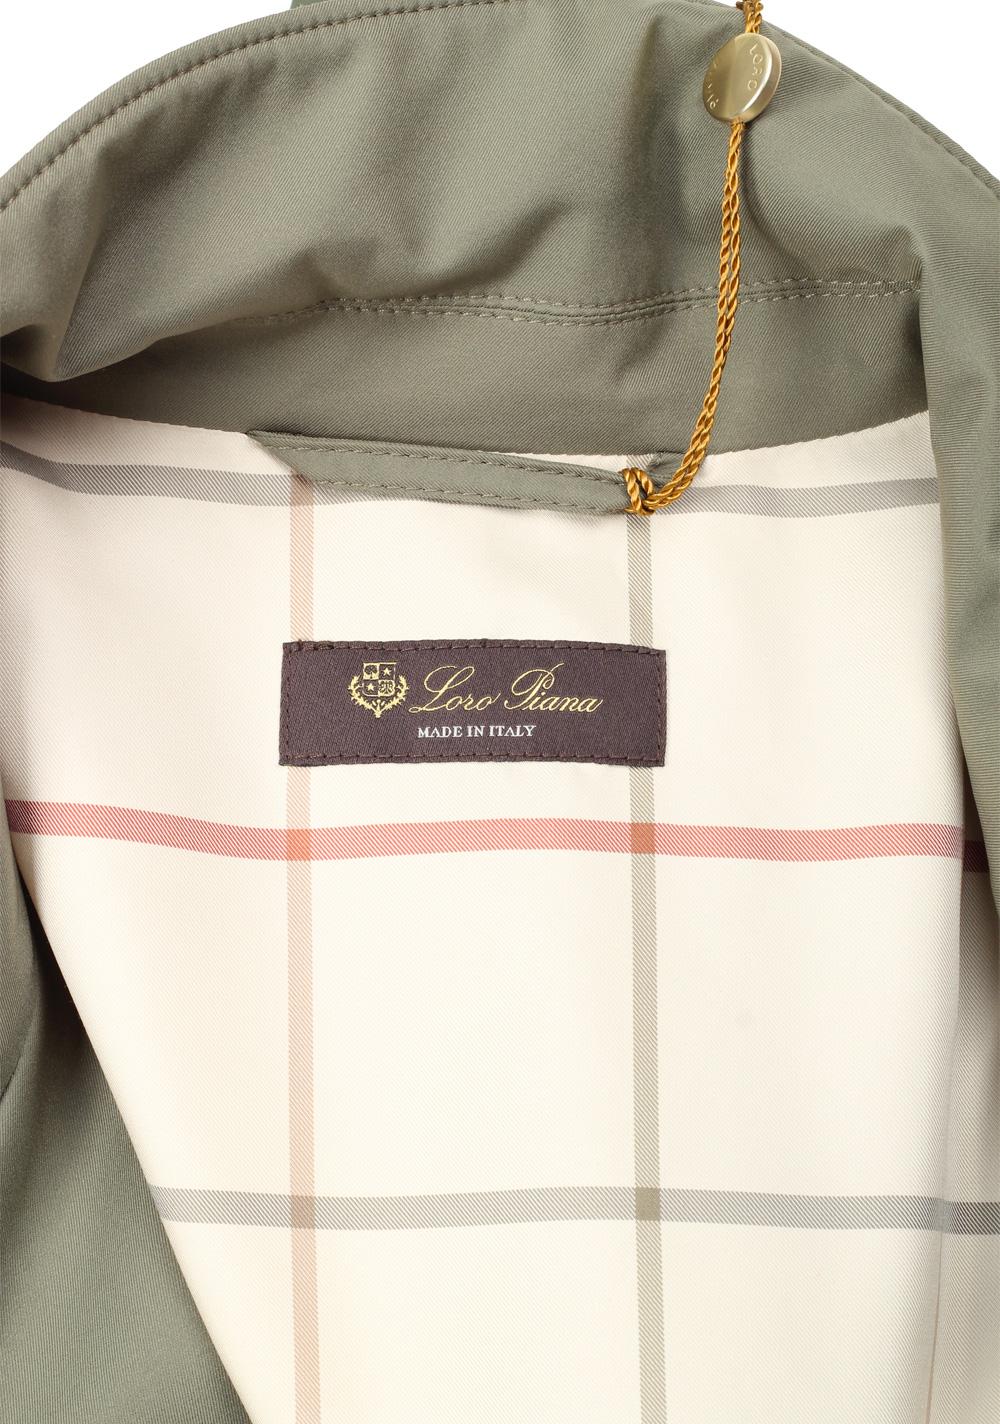 Loro Piana Green Storm System Sebring Coat Size XXXL / 48. U.S.  Outerwear | Costume Limité